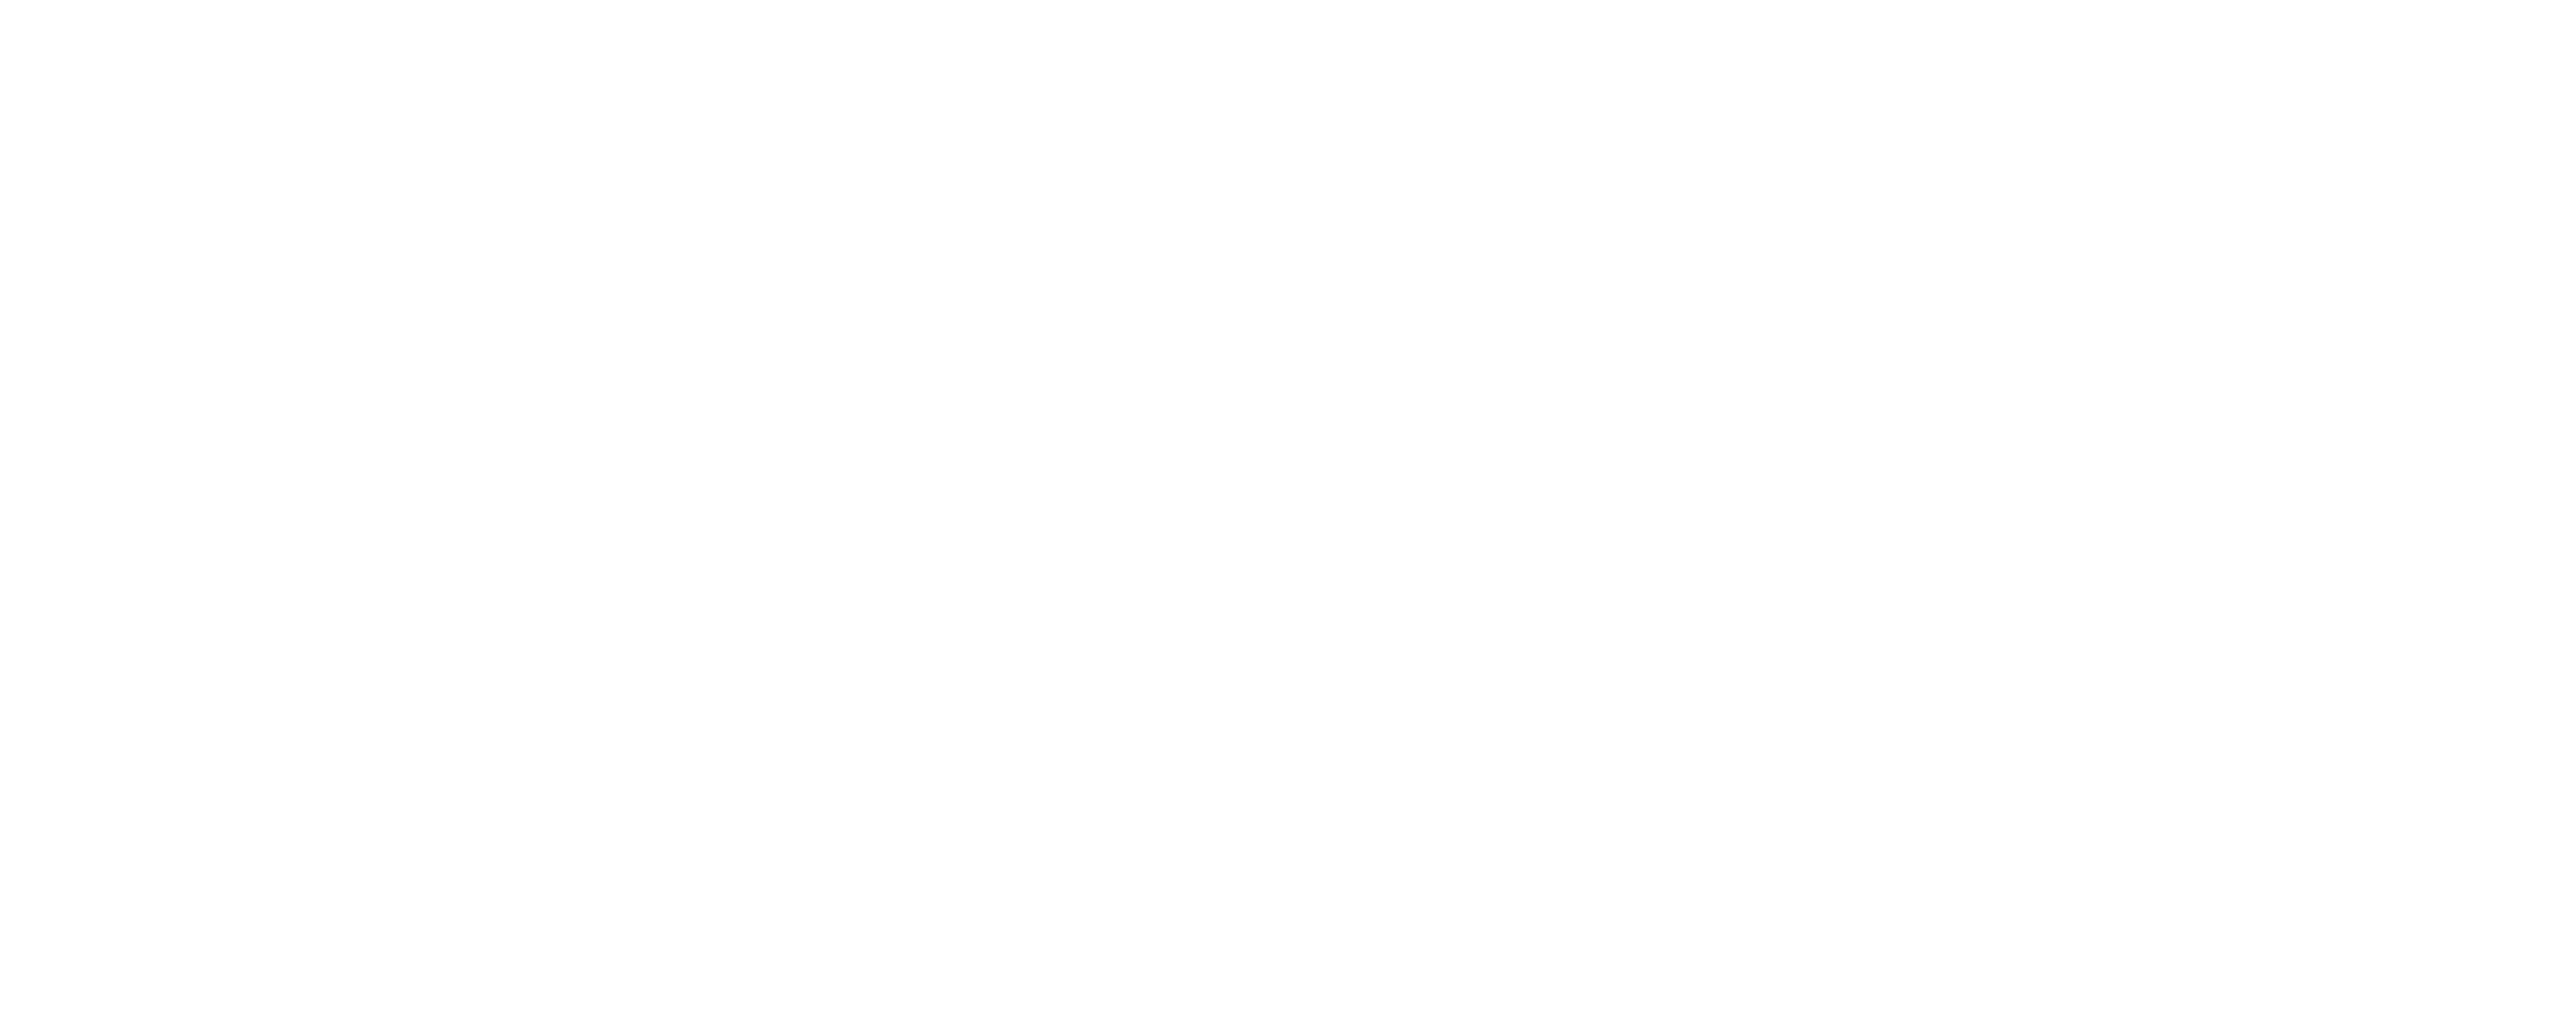 friendship_games_logo_all_white_horiz